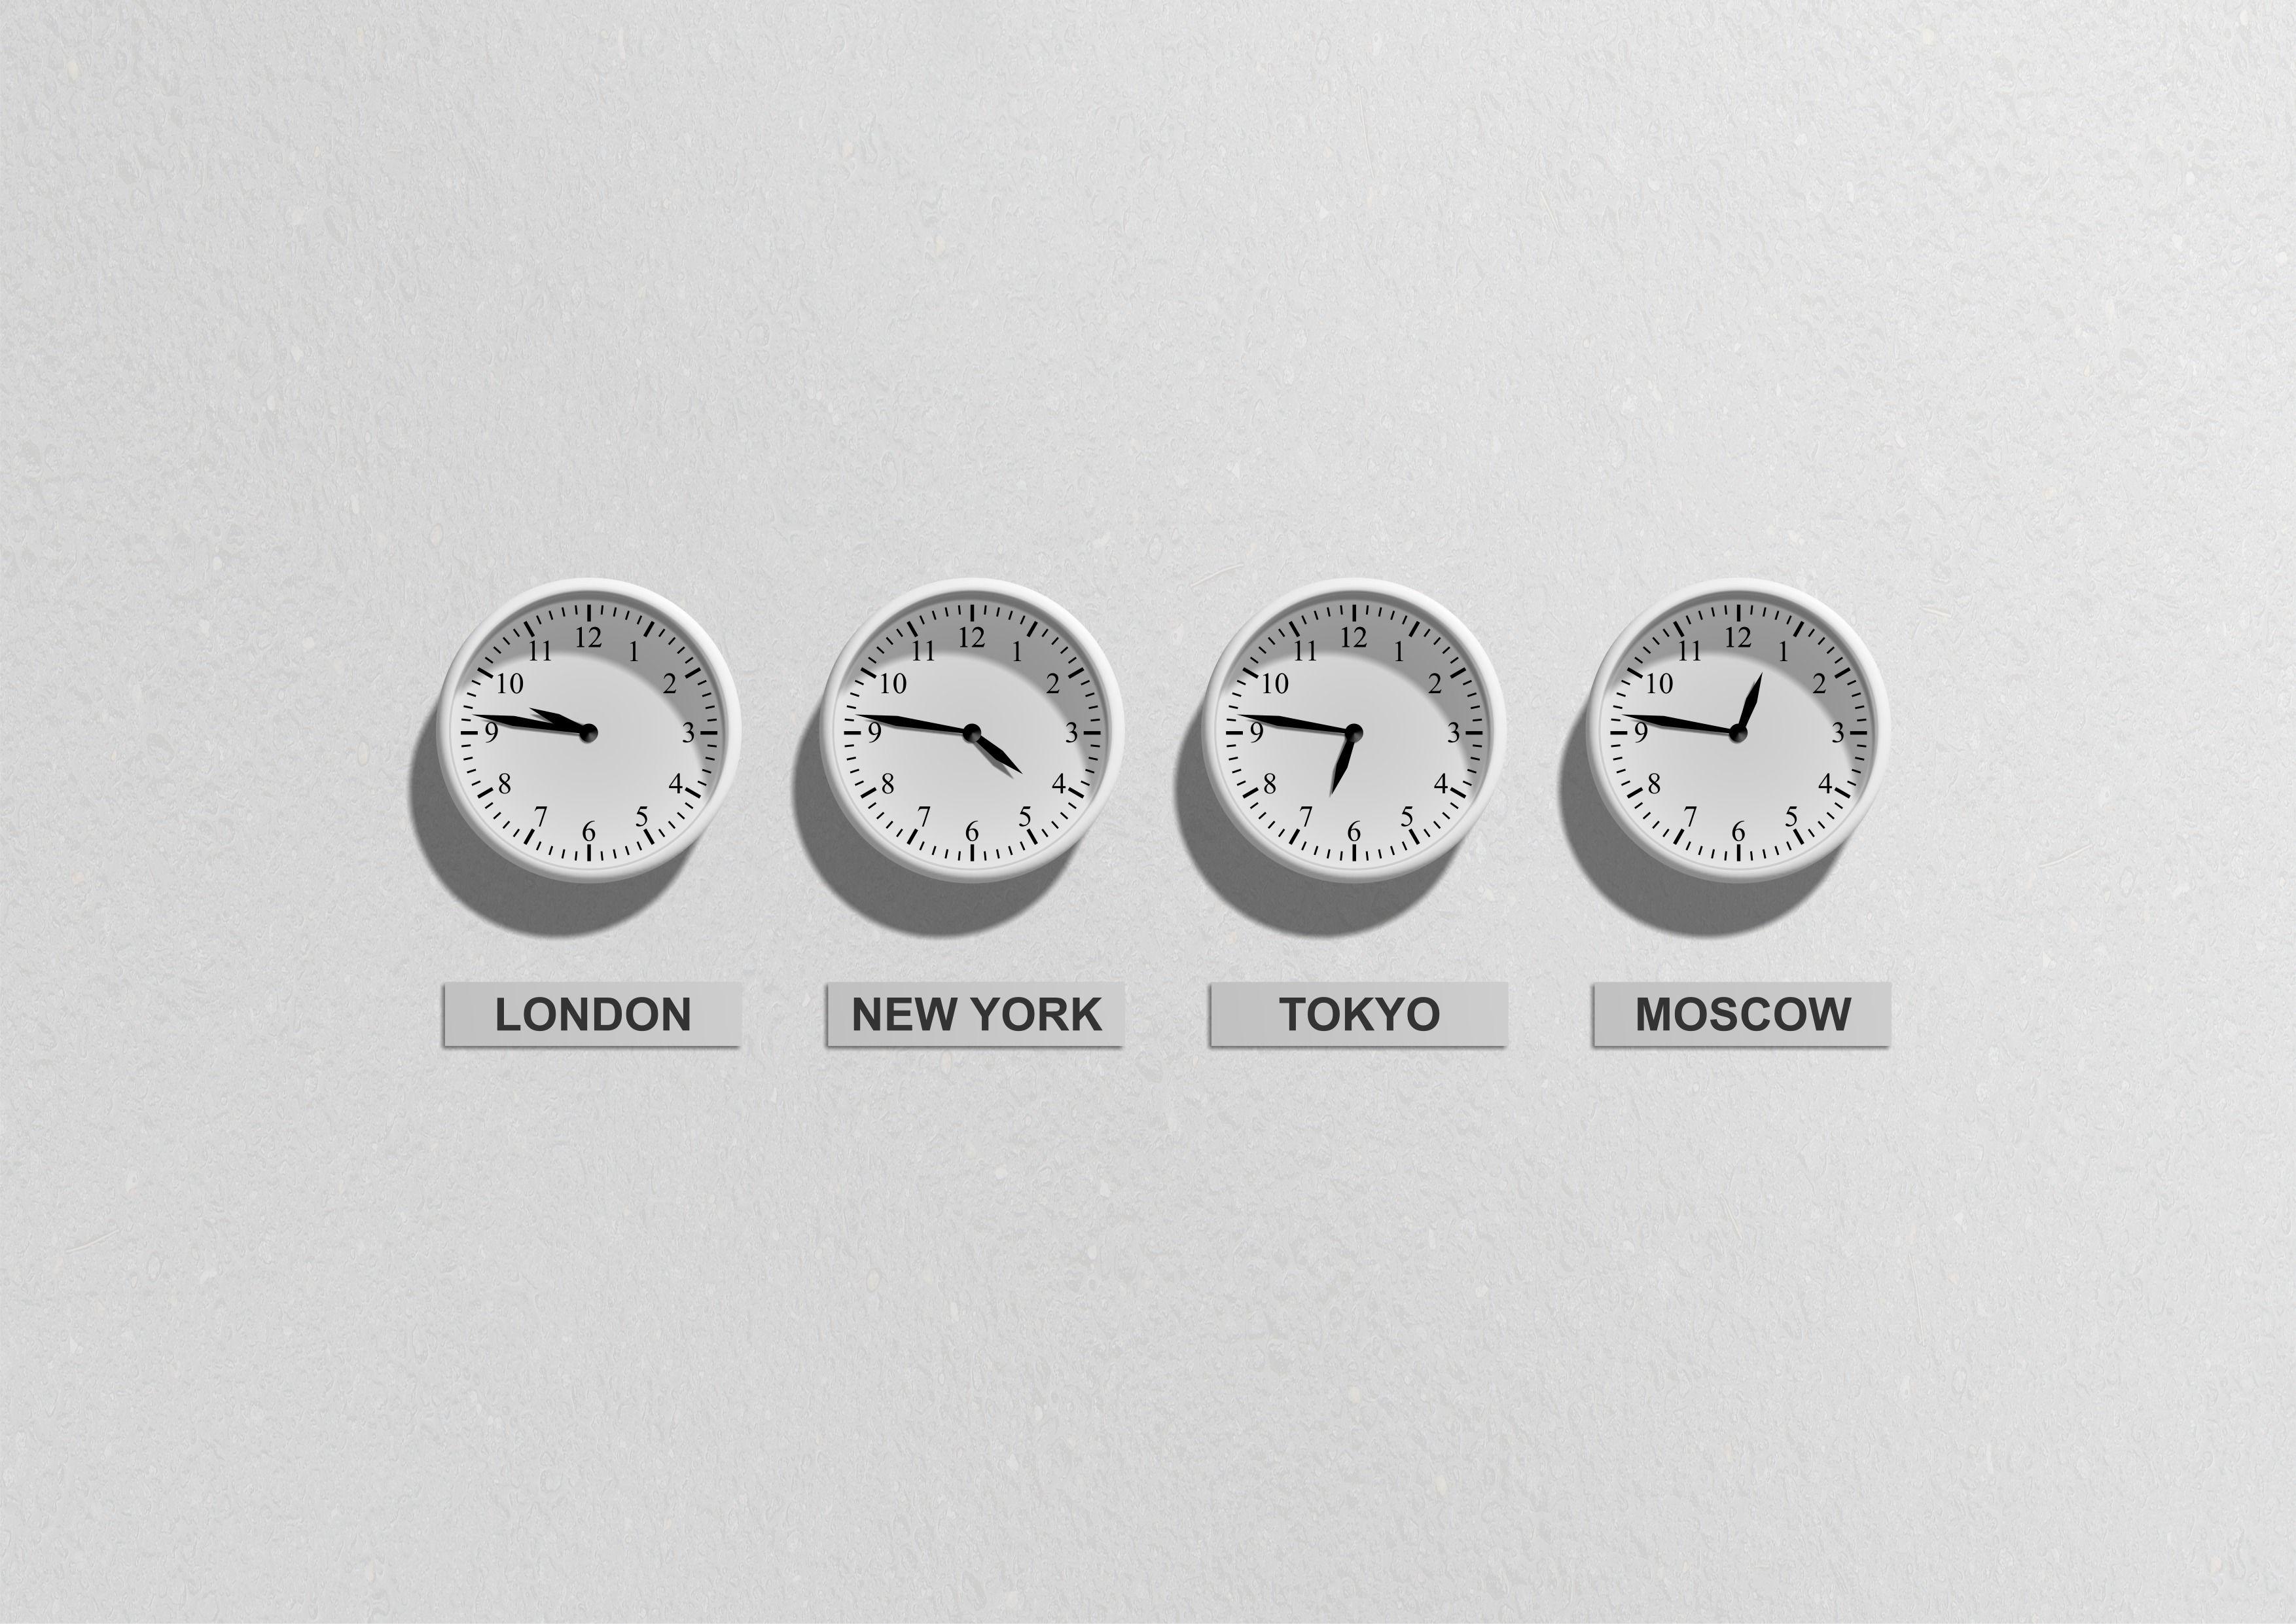 business-time-clock-clocks-48770.jpeg